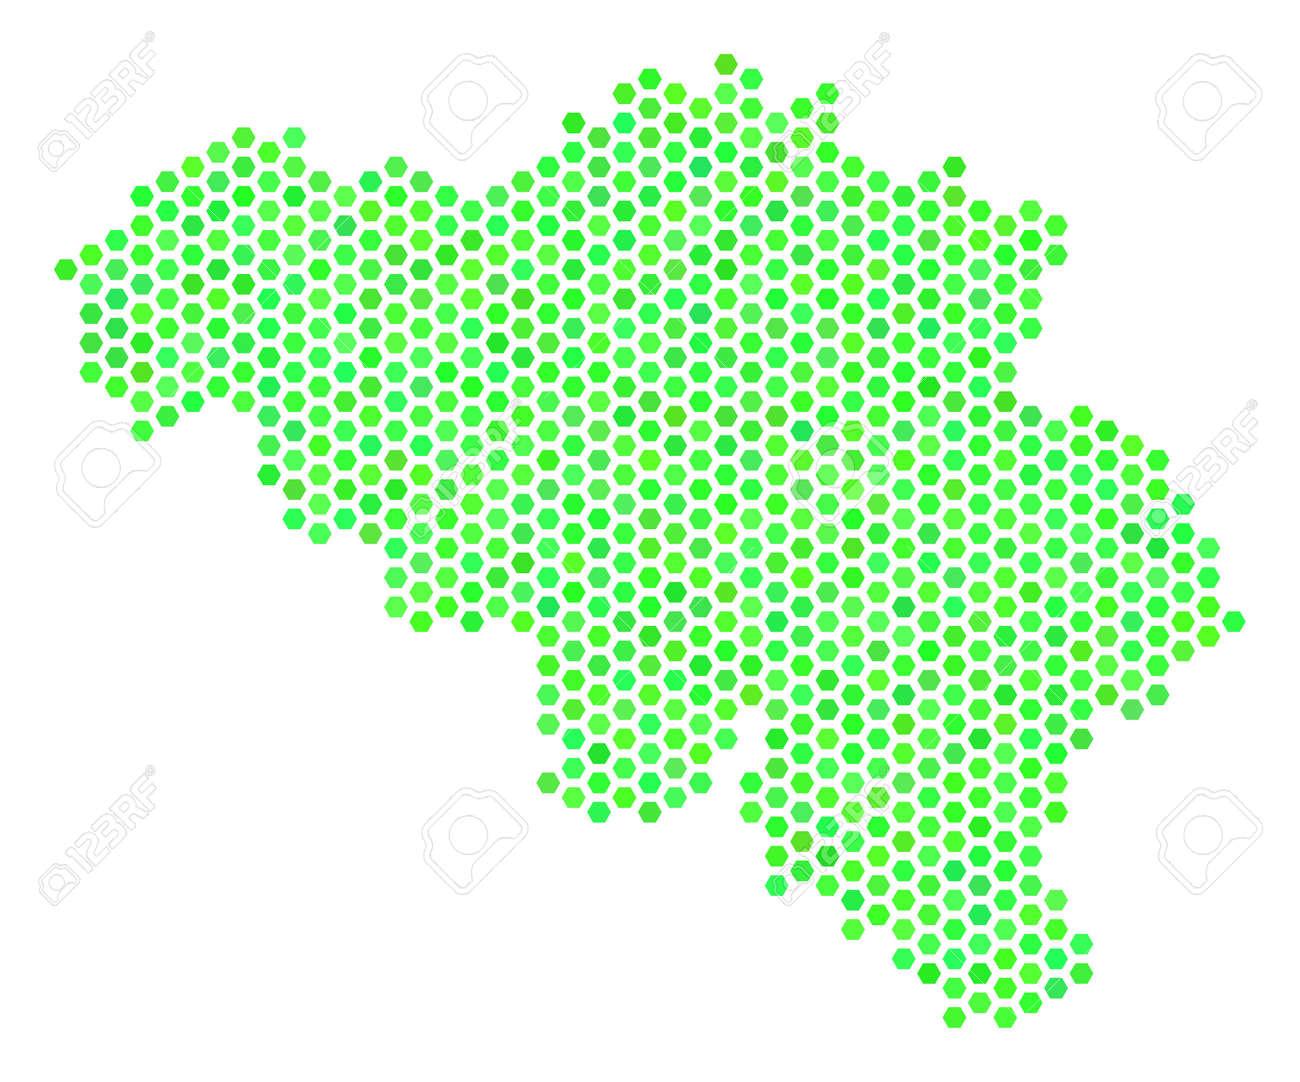 eco green belgium map vector hexagonal territorial plan using green color shades abstract belgium